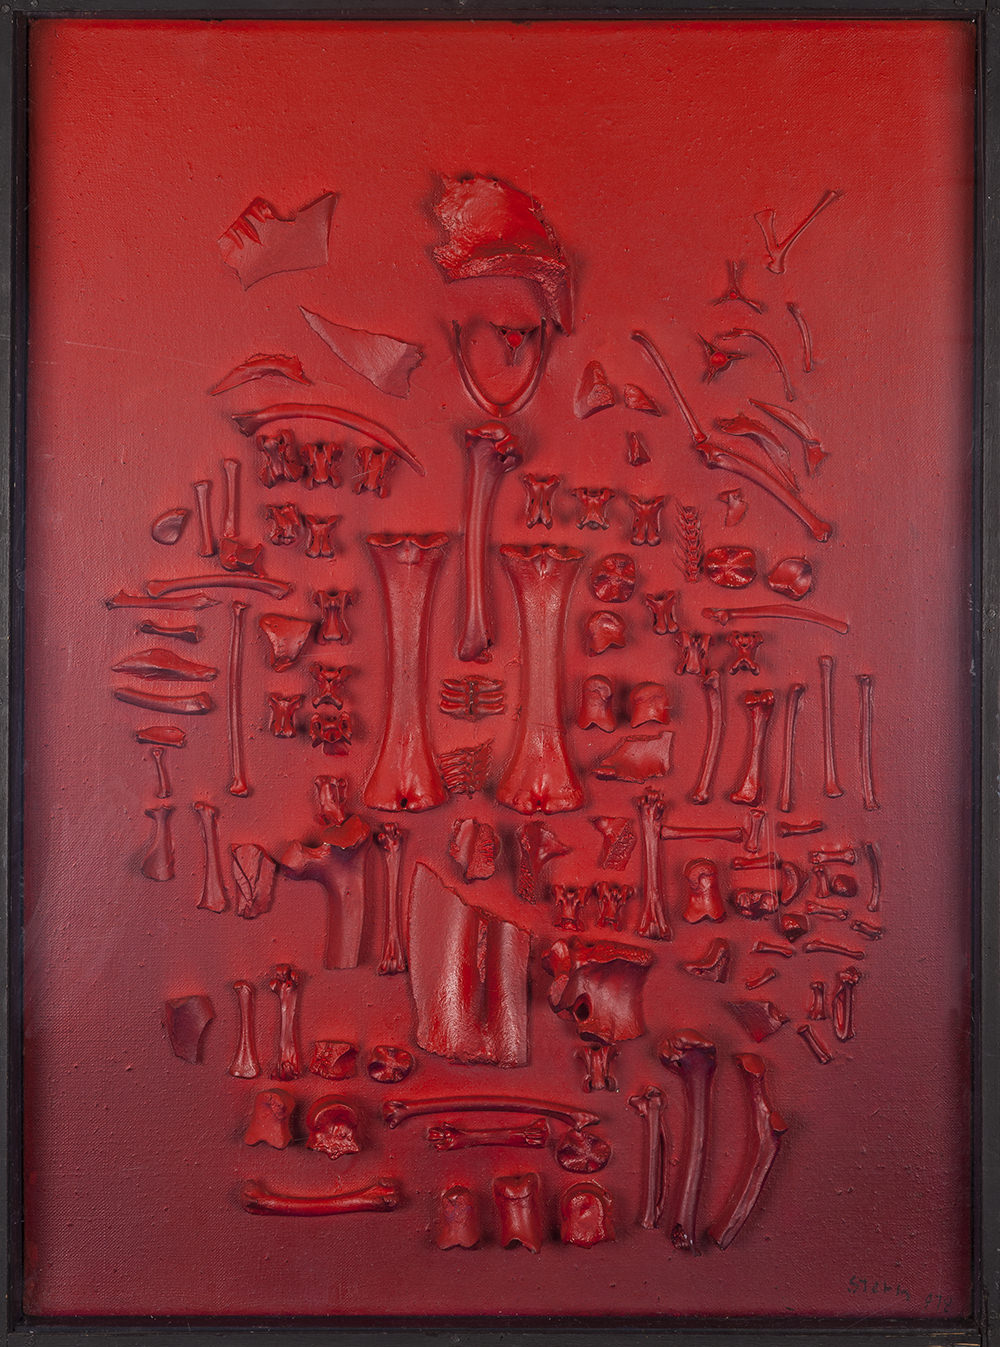 Jonasz Stern, malarz, niezła sztuka